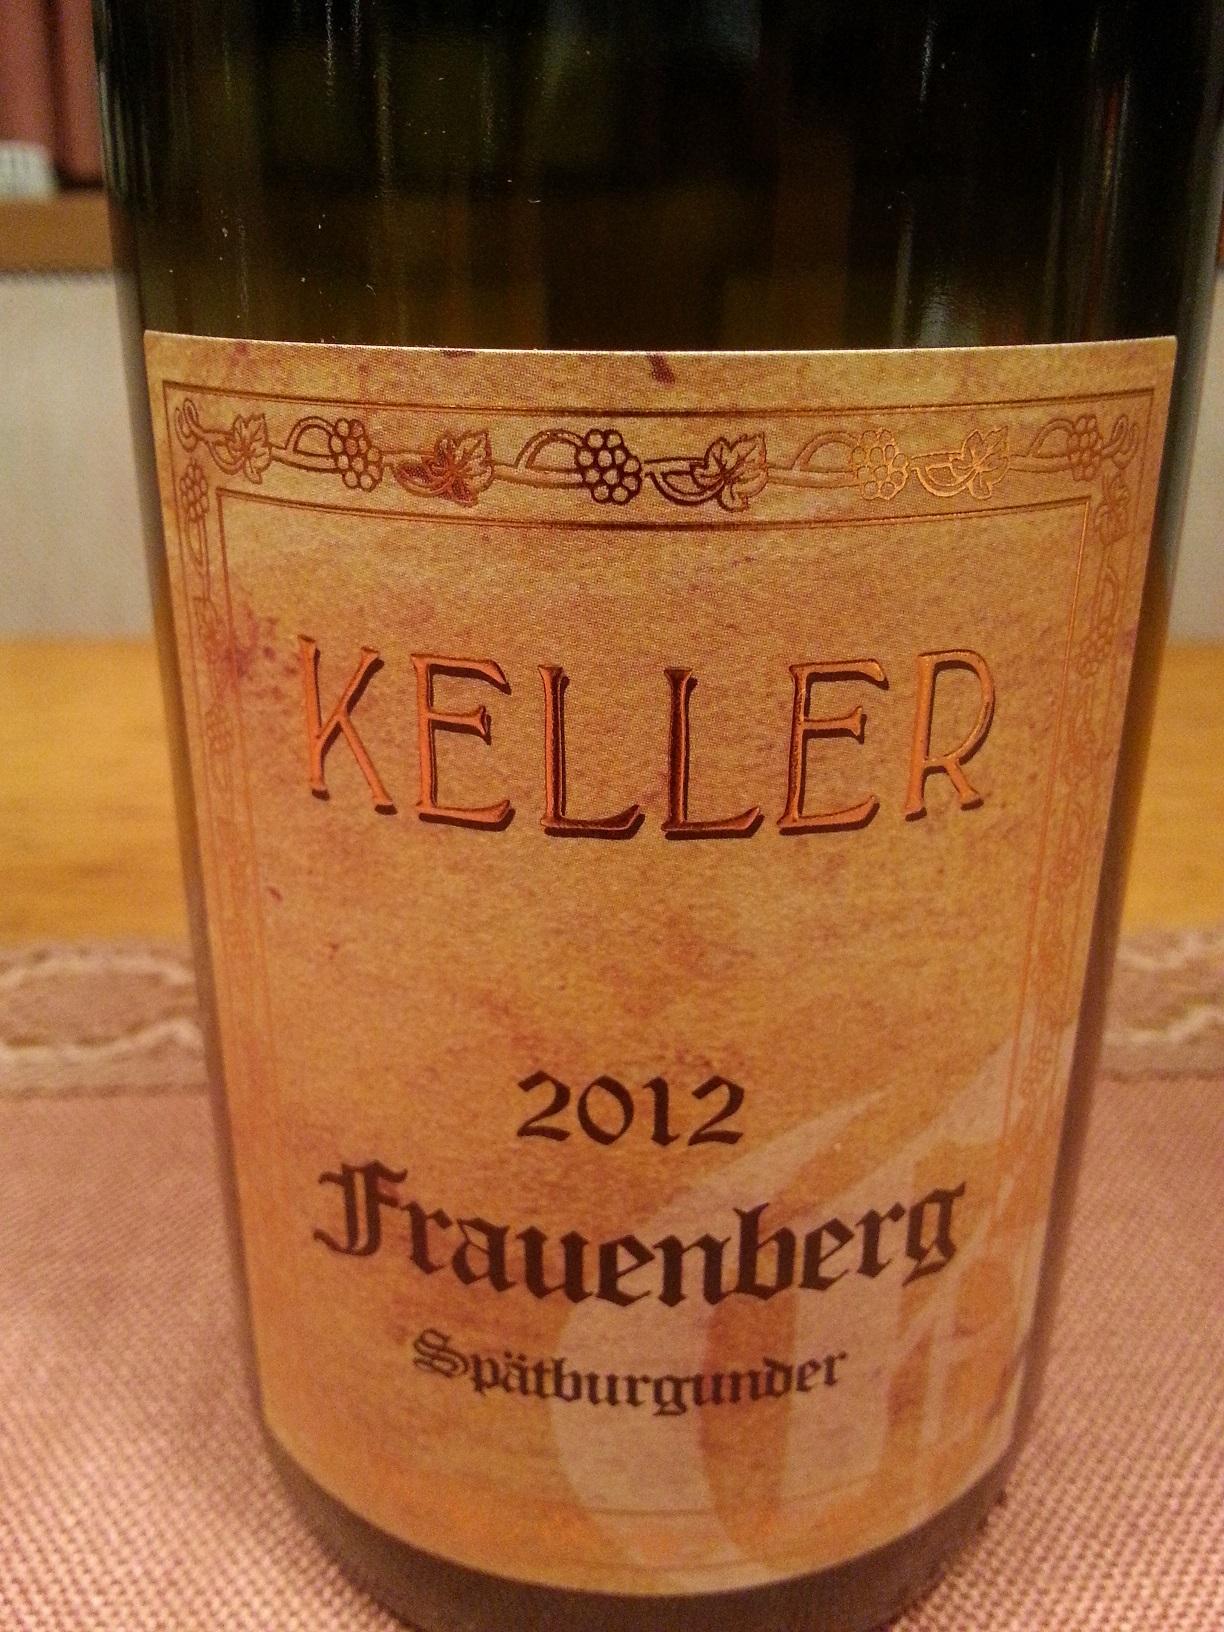 2012 Spätburgunder Frauenberg   Keller